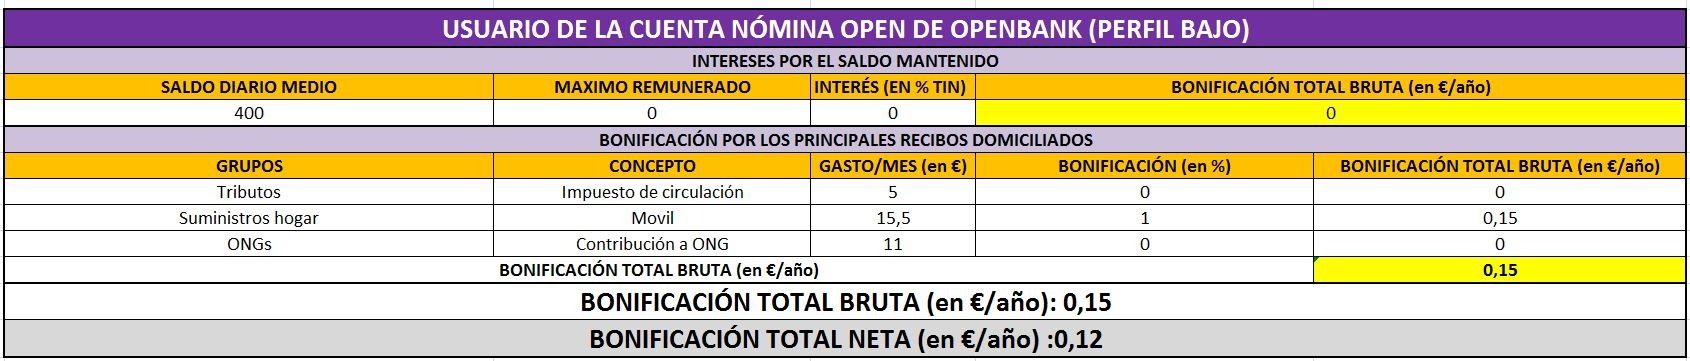 Openbank%20perfil%20bajo